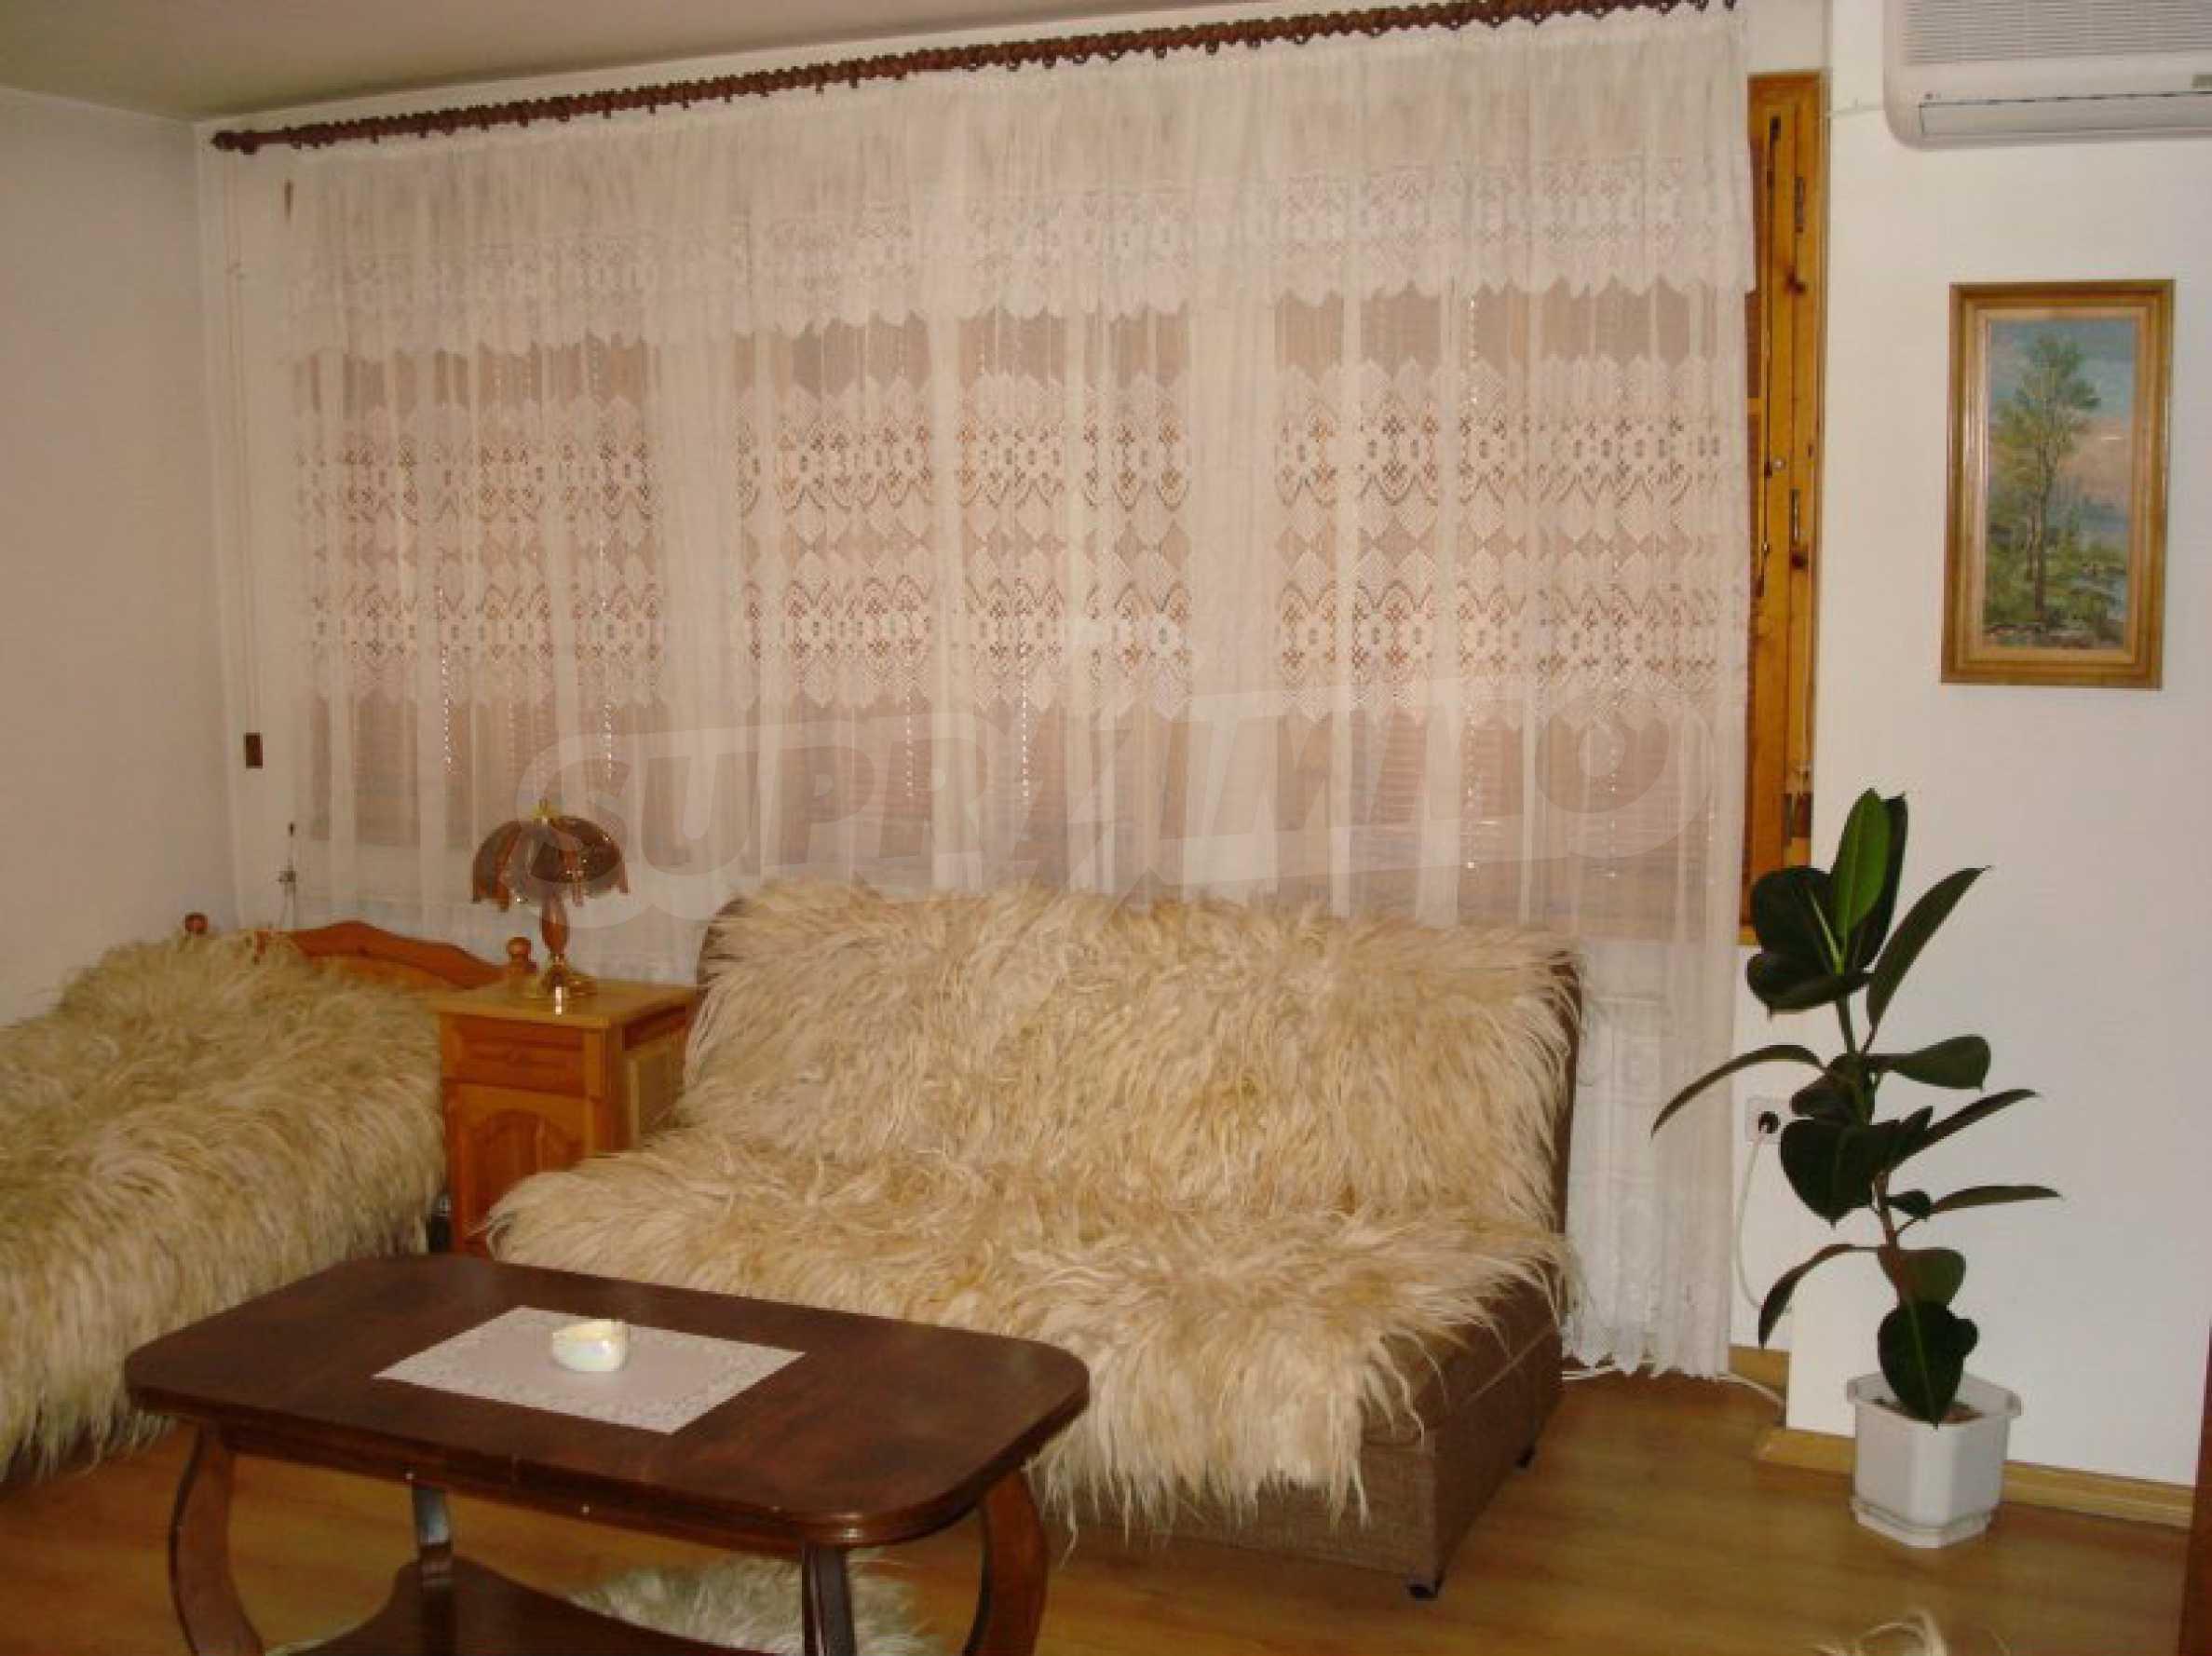 Hotelanlage mit Restaurant am Ufer des Flusses Osam in Lovech 34